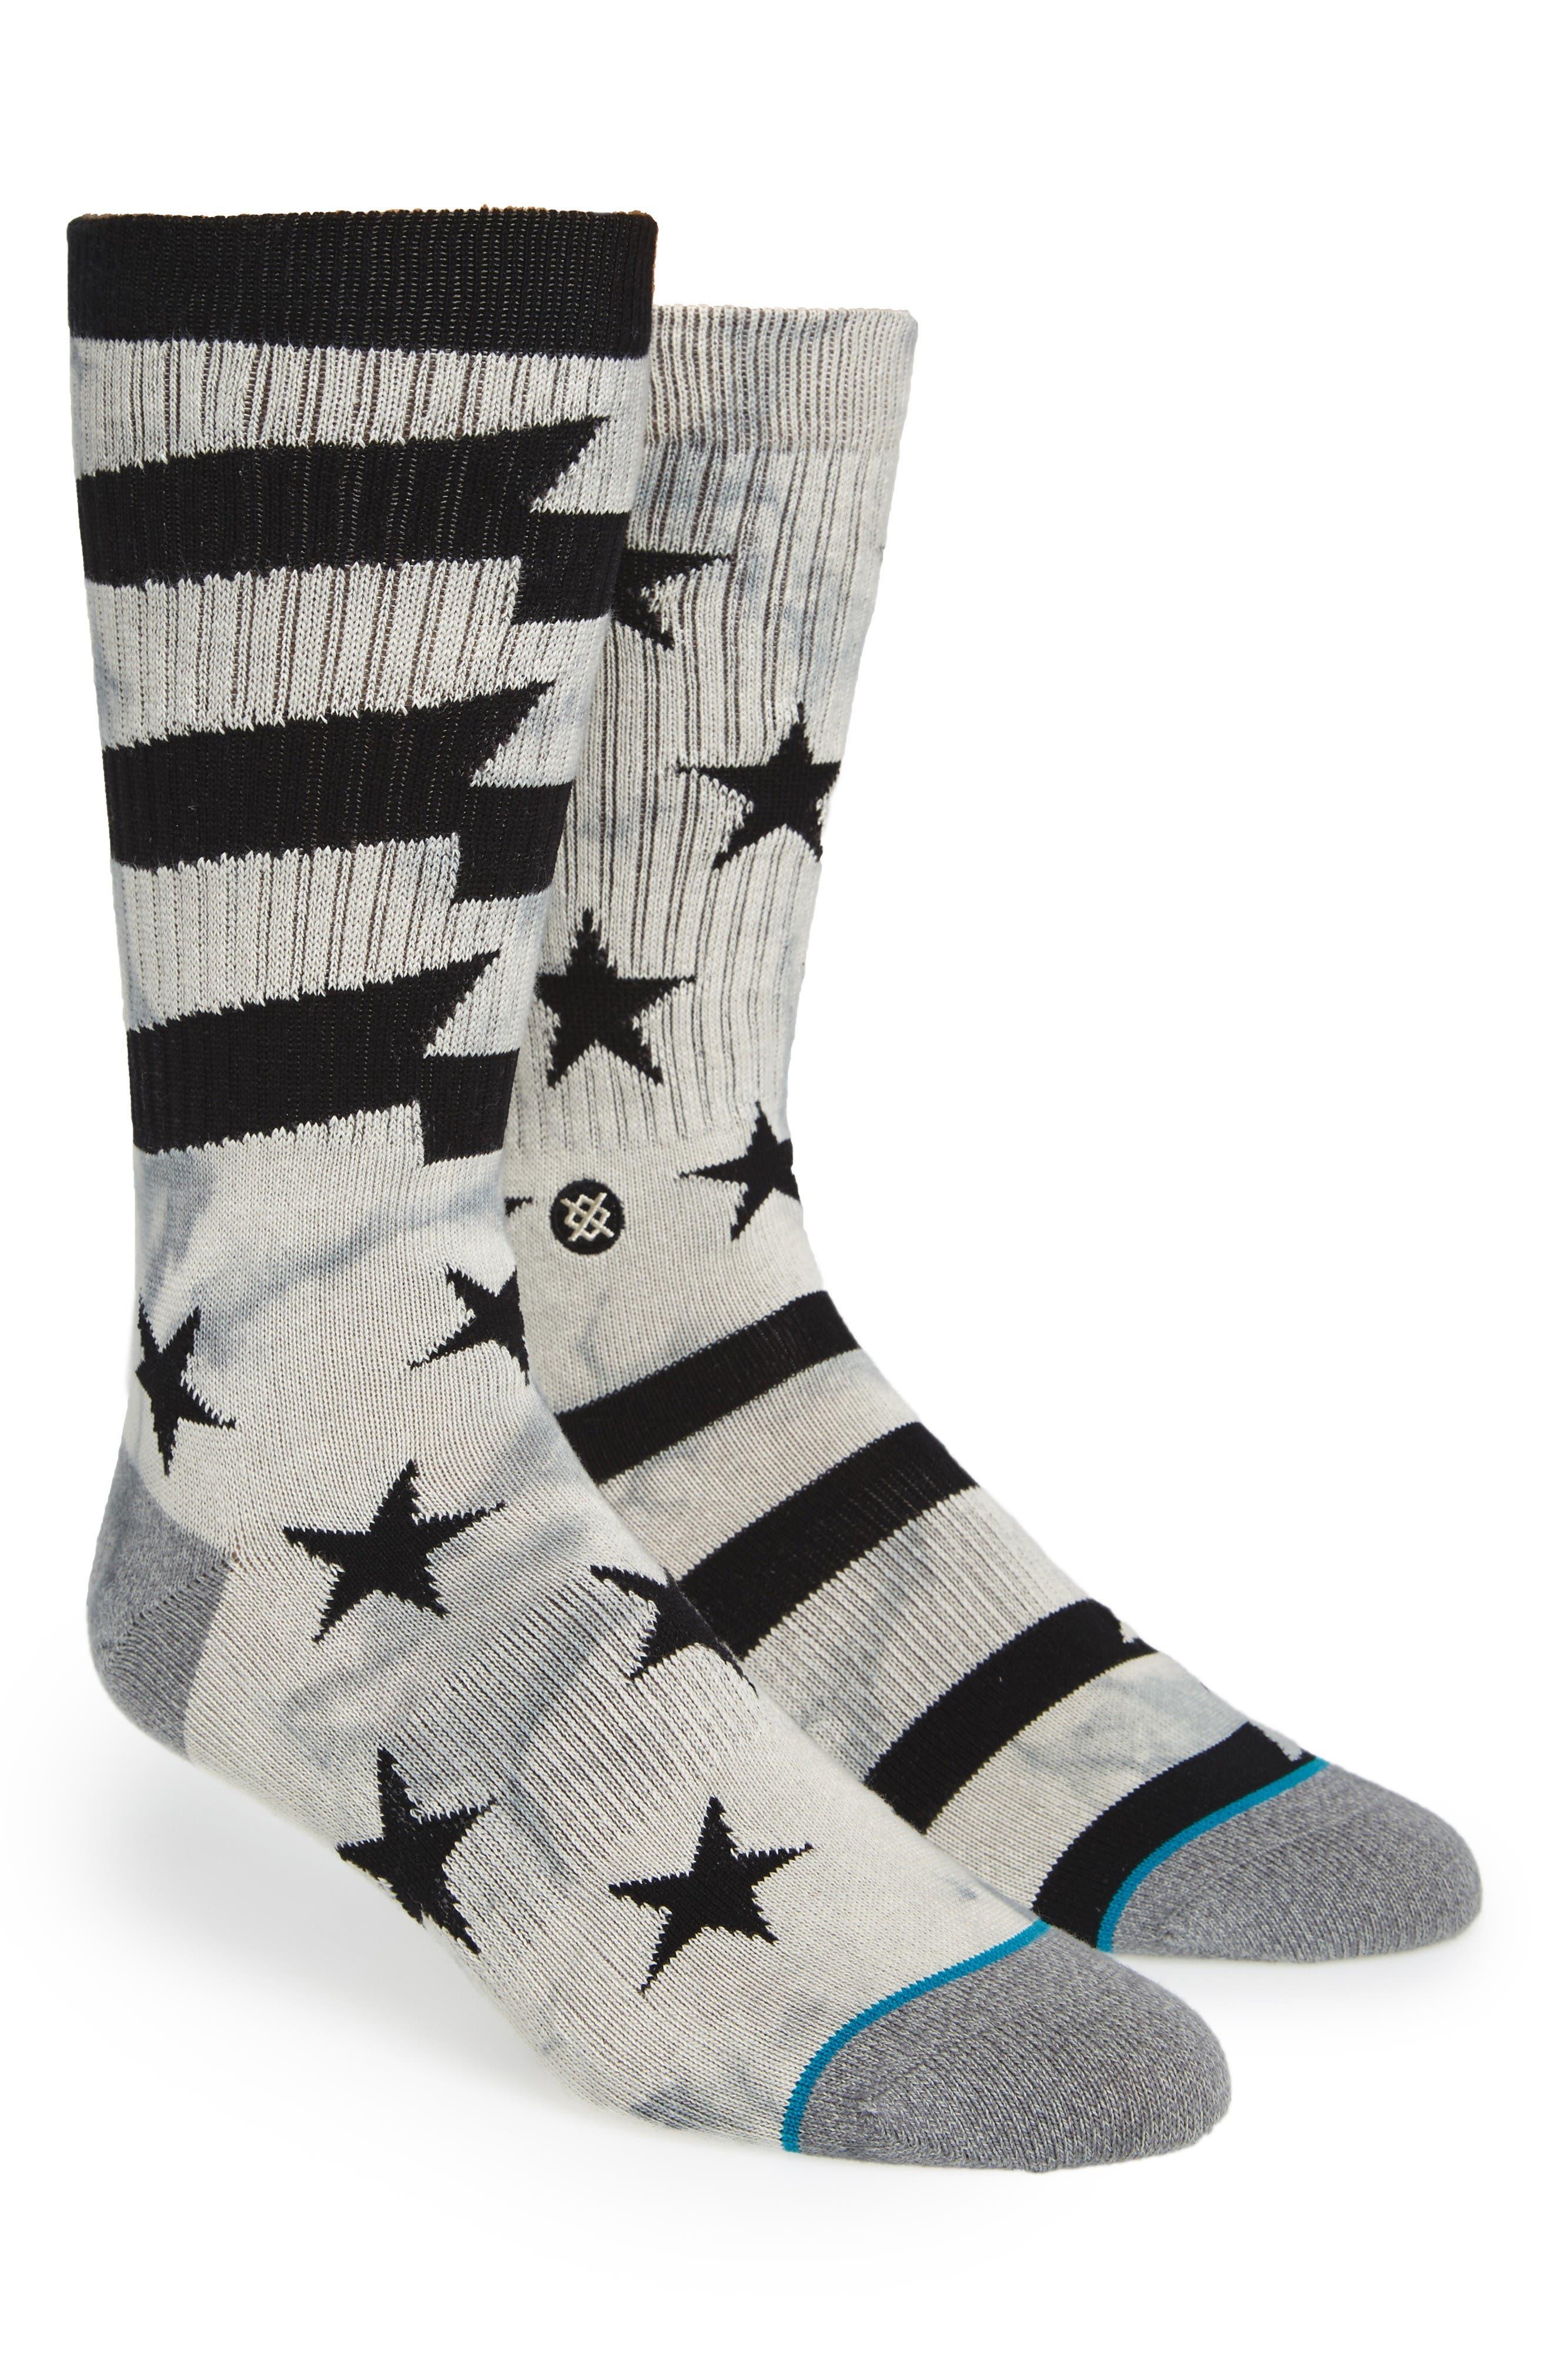 Stance Sidereal Crew Socks